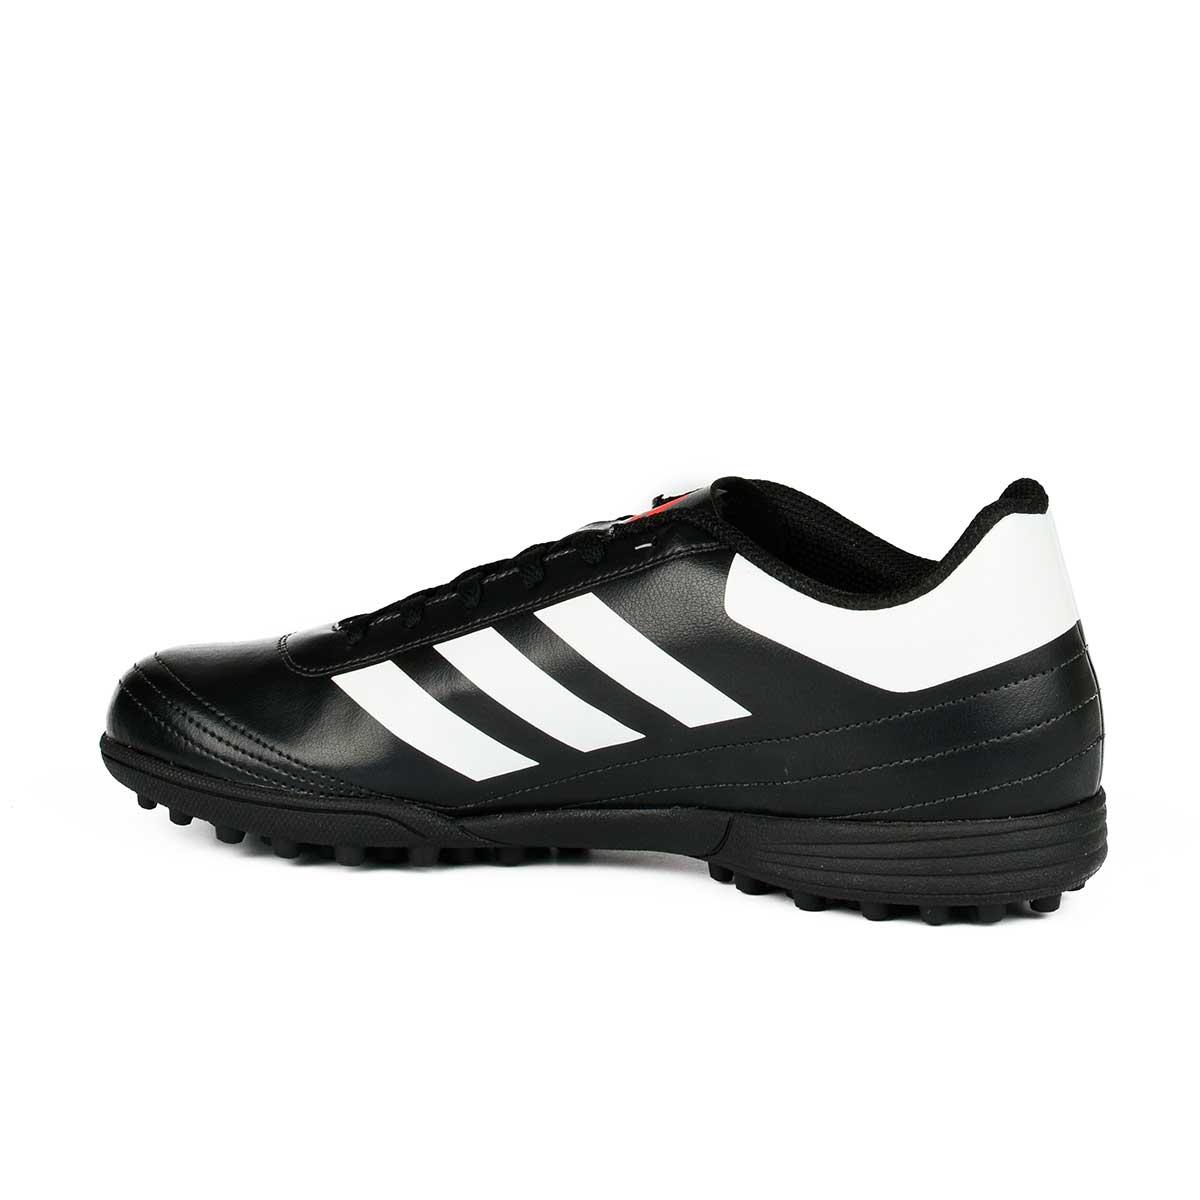 966117bfc2 Chuteira Society Adidas Goletto VI TF Preto Branco. Referência  Adidas  AQ4299